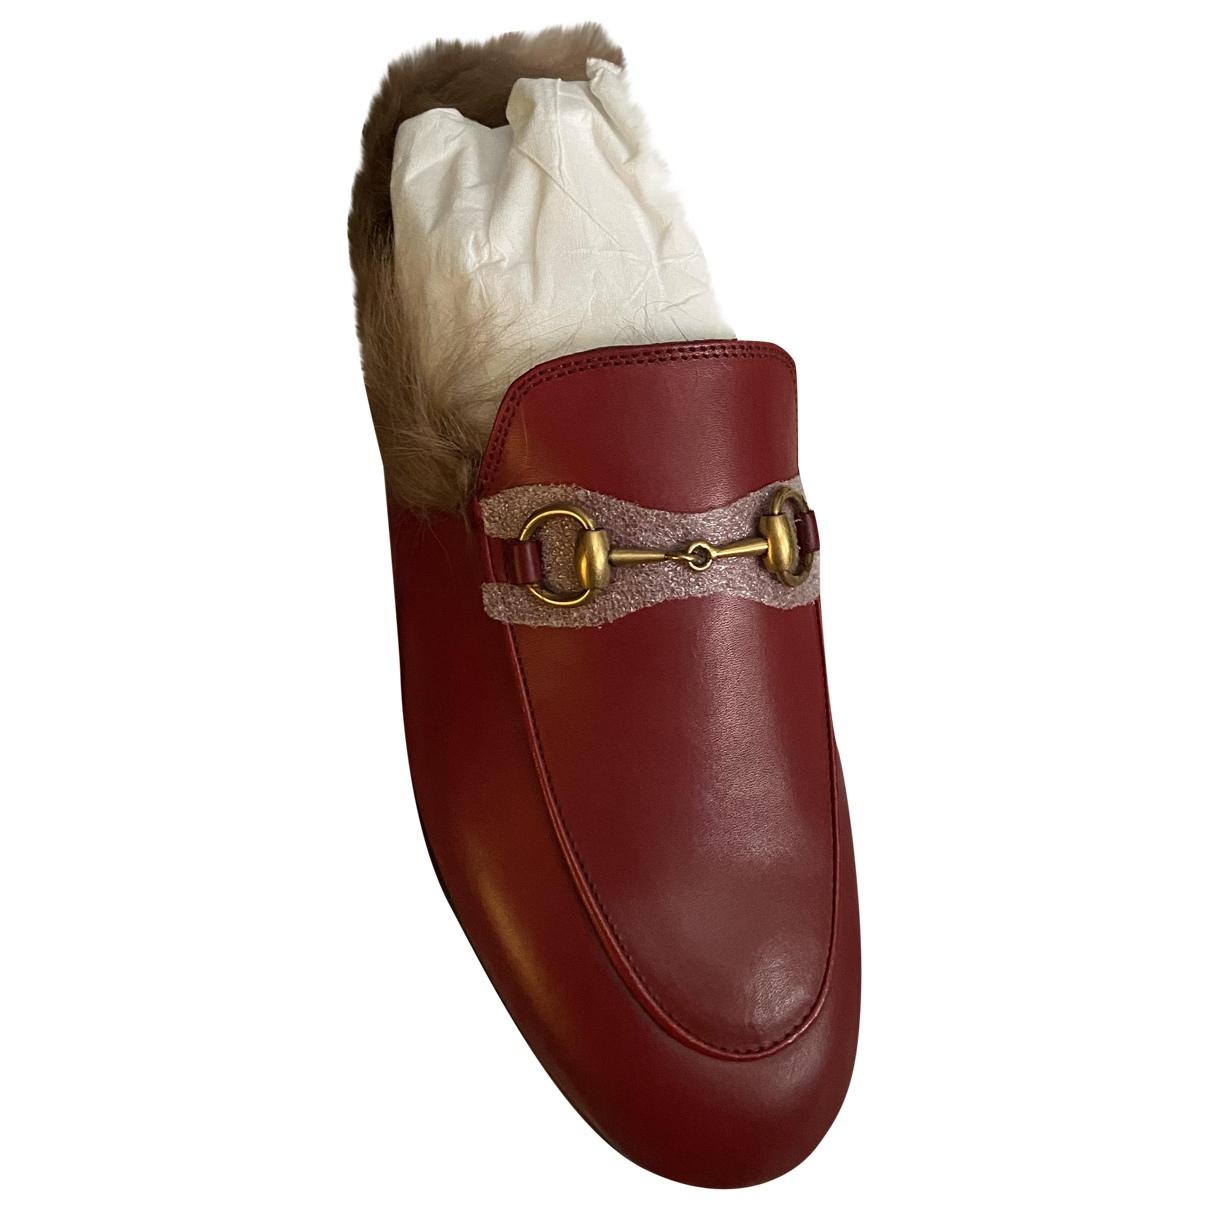 Gucci Princetown Burgundy Leather Flats for Women 36.5 EU